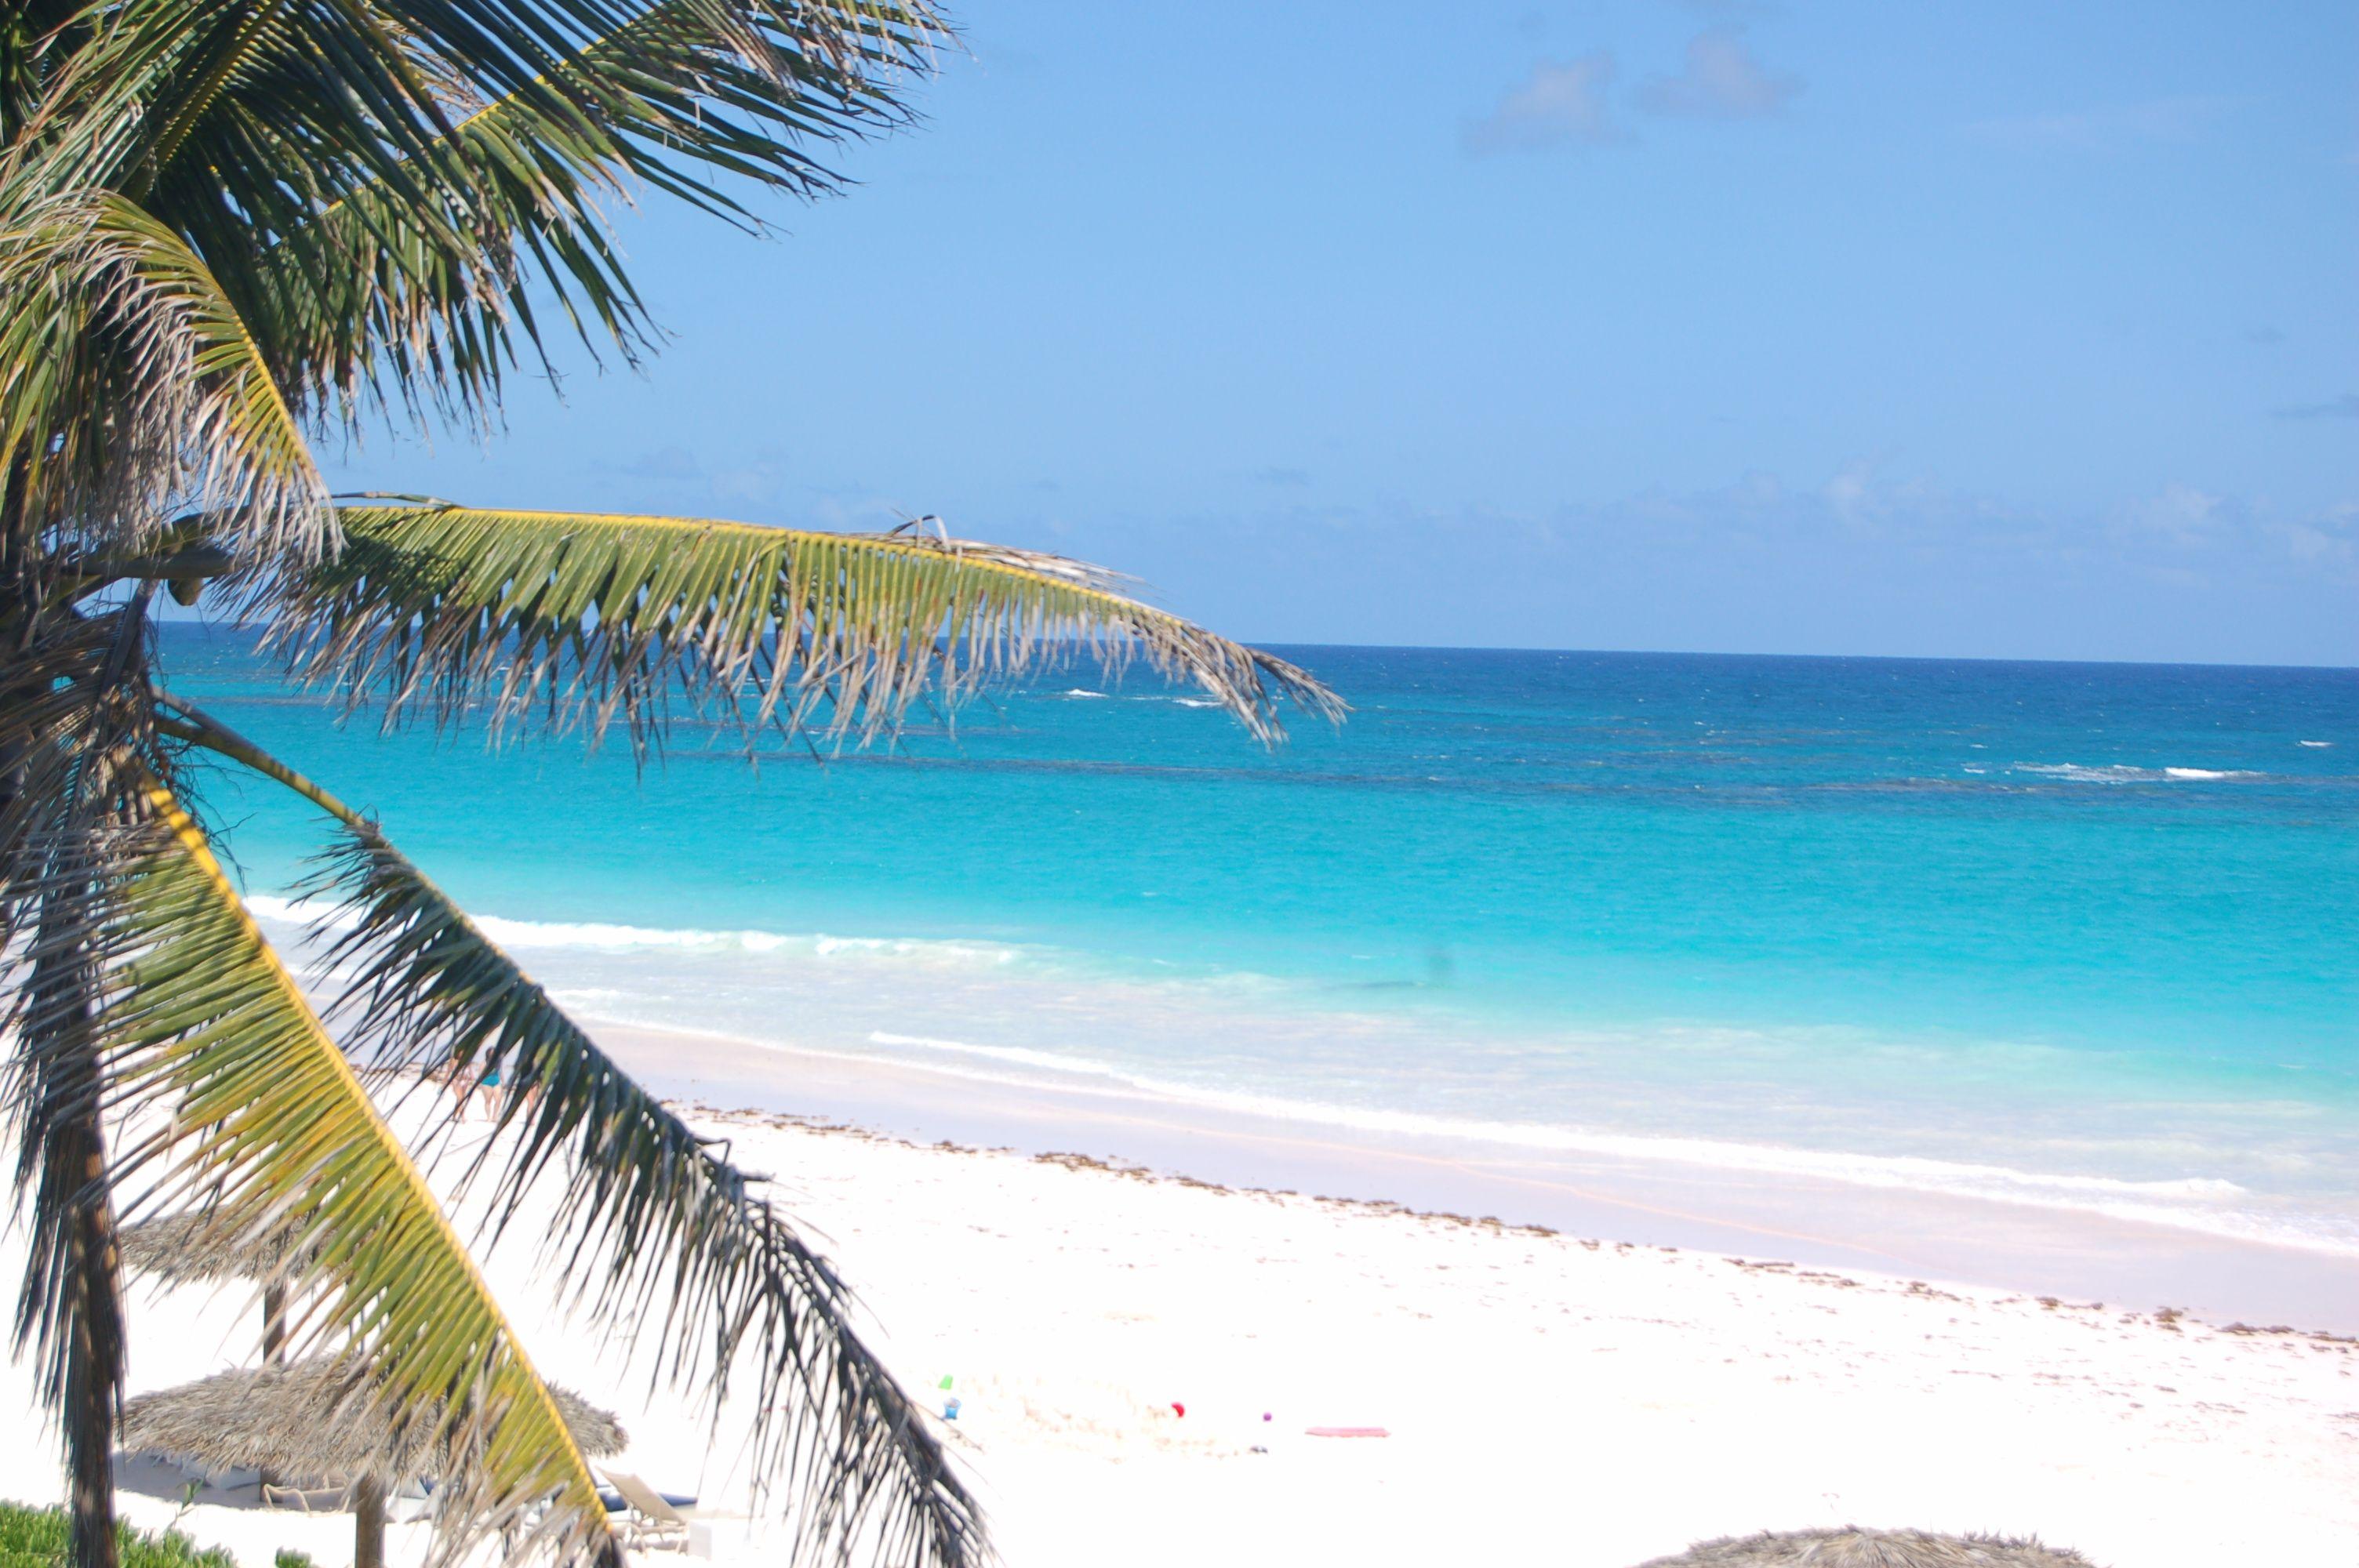 Pink Sand Beach Harbour Island Bahamas Bahamas Vacation Vacation Time Beautiful Places